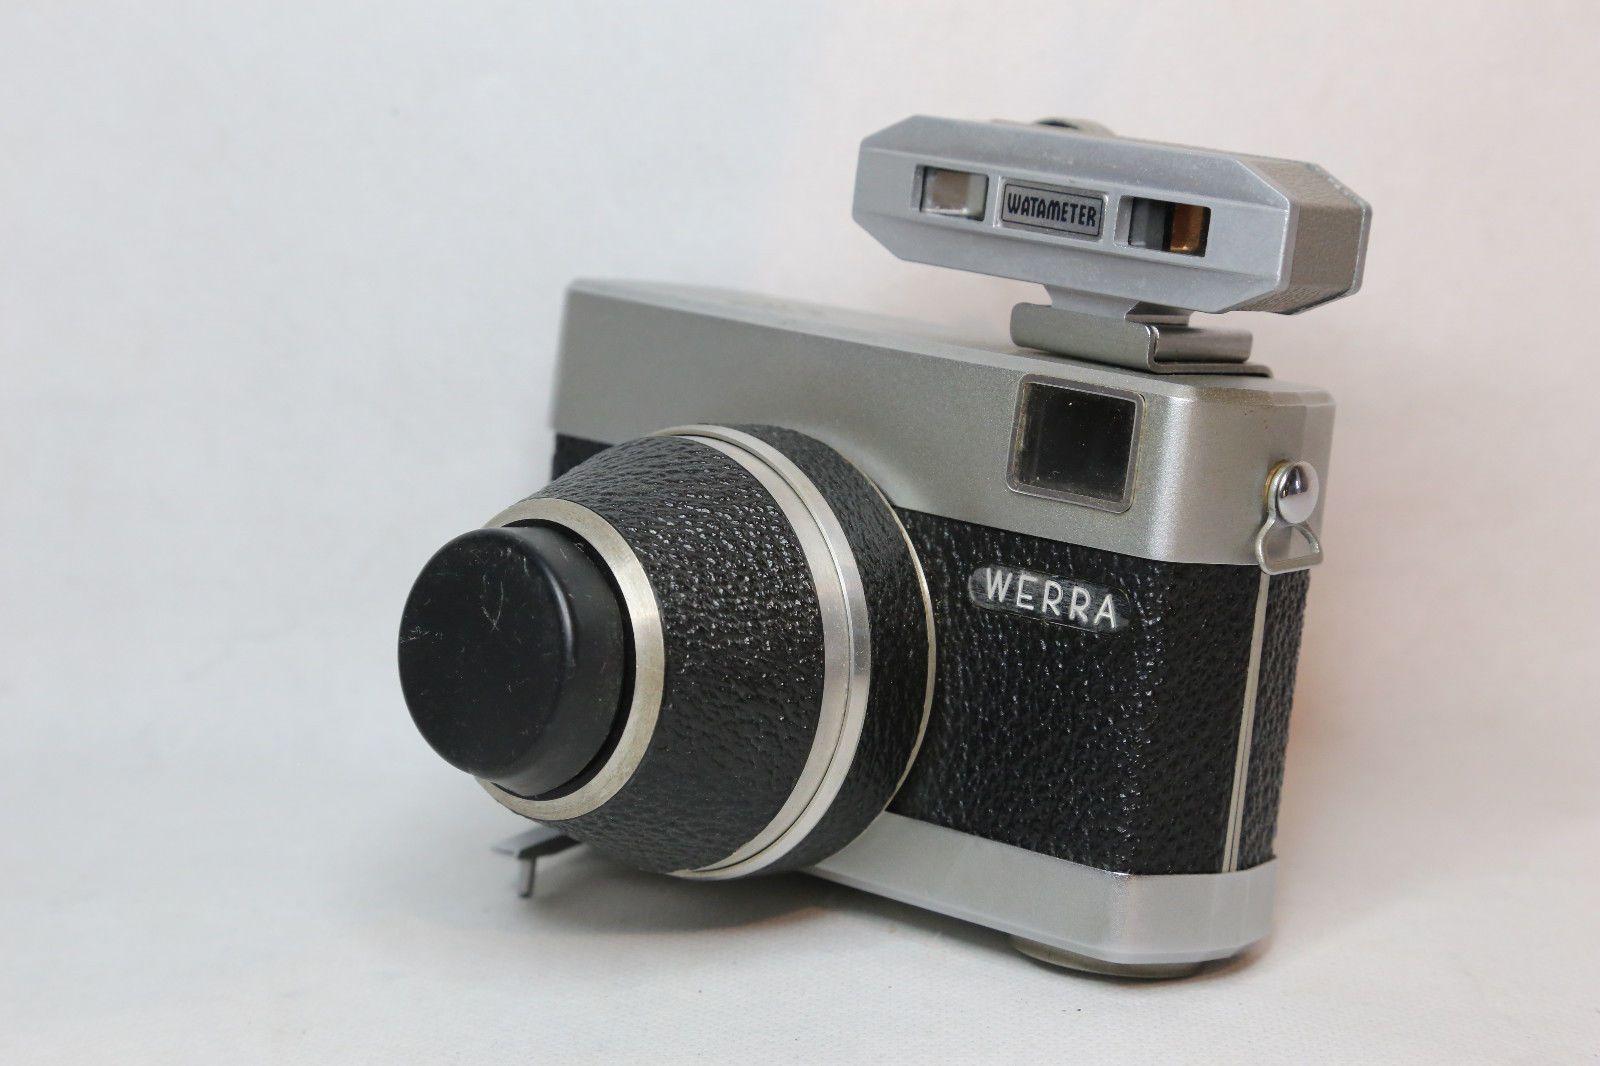 Vintage Carl Zeiss Werra 35mm Black Camera With Green Watameter C1950 Ebay Vintage Cameras Classic Camera Camera